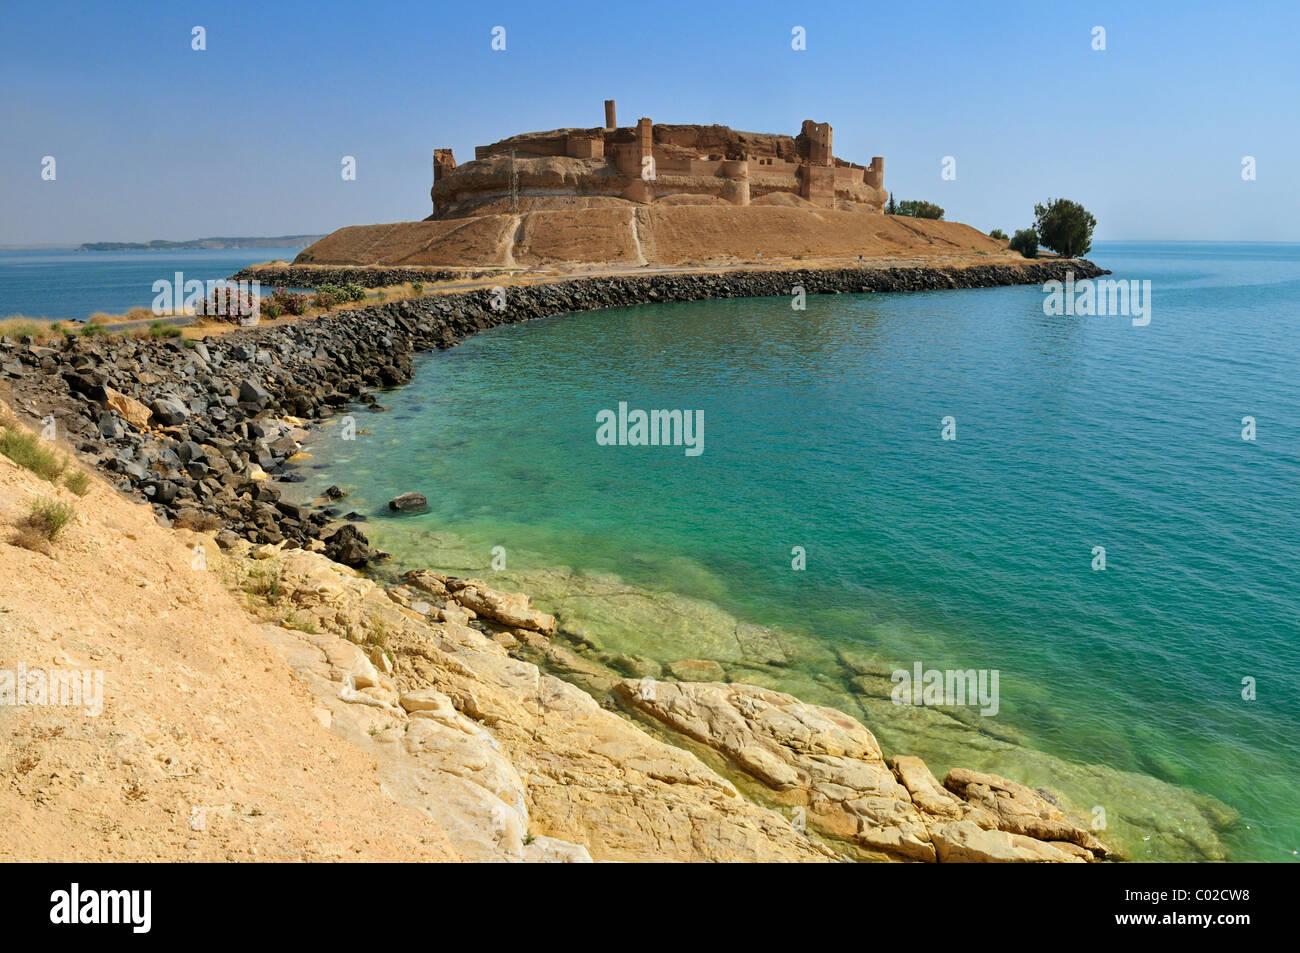 Historic castle of Qalaat Jabar overlooking Assad Lake, Euphrates, Syria, Middle East, West Asia - Stock Image